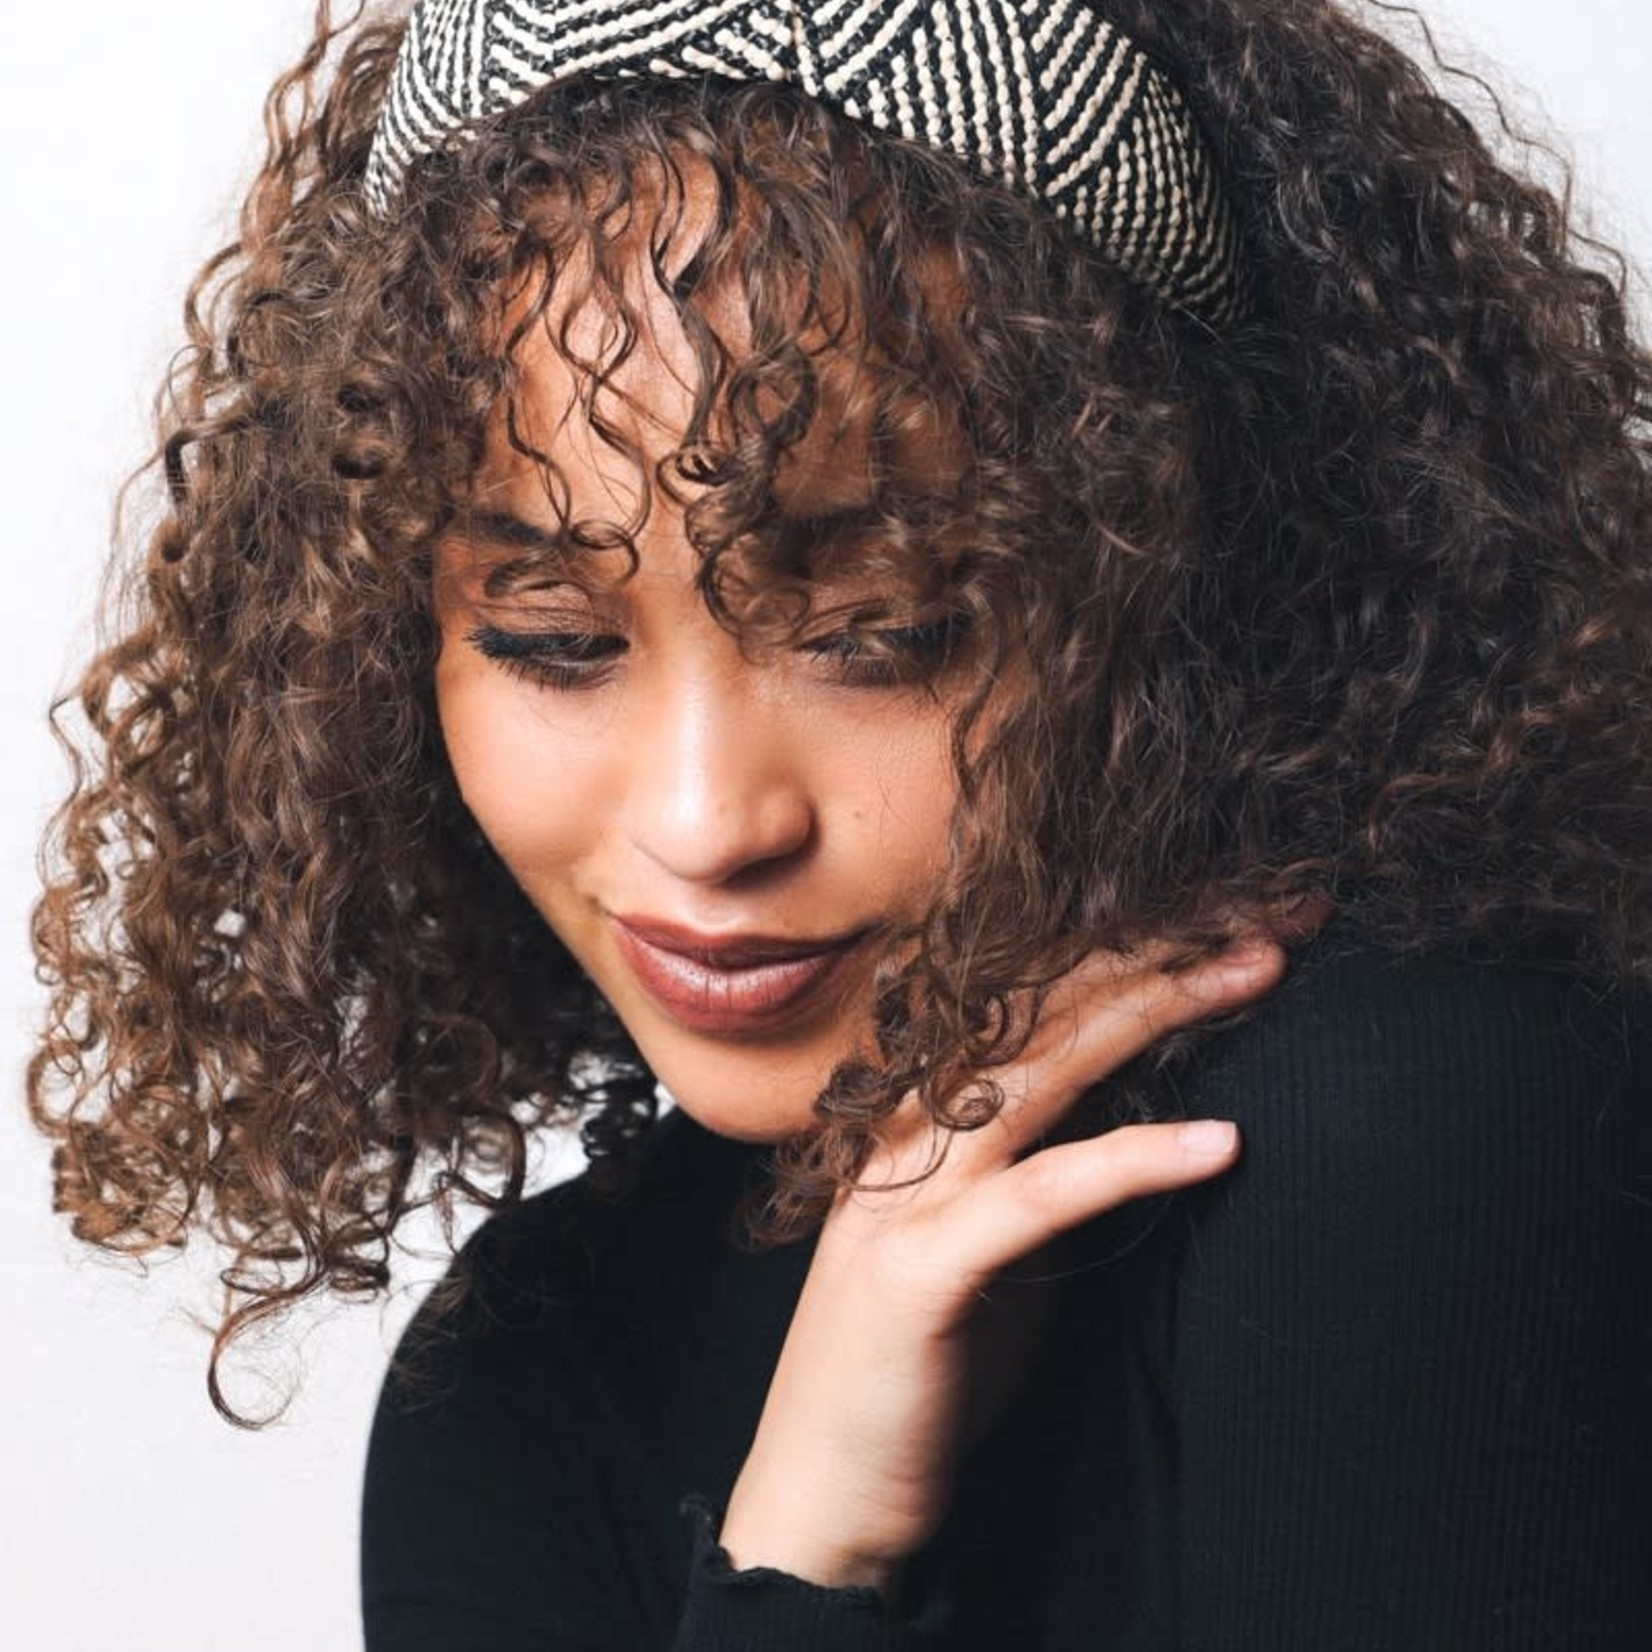 leto Bohemian Straw Rattan Knotted Headband